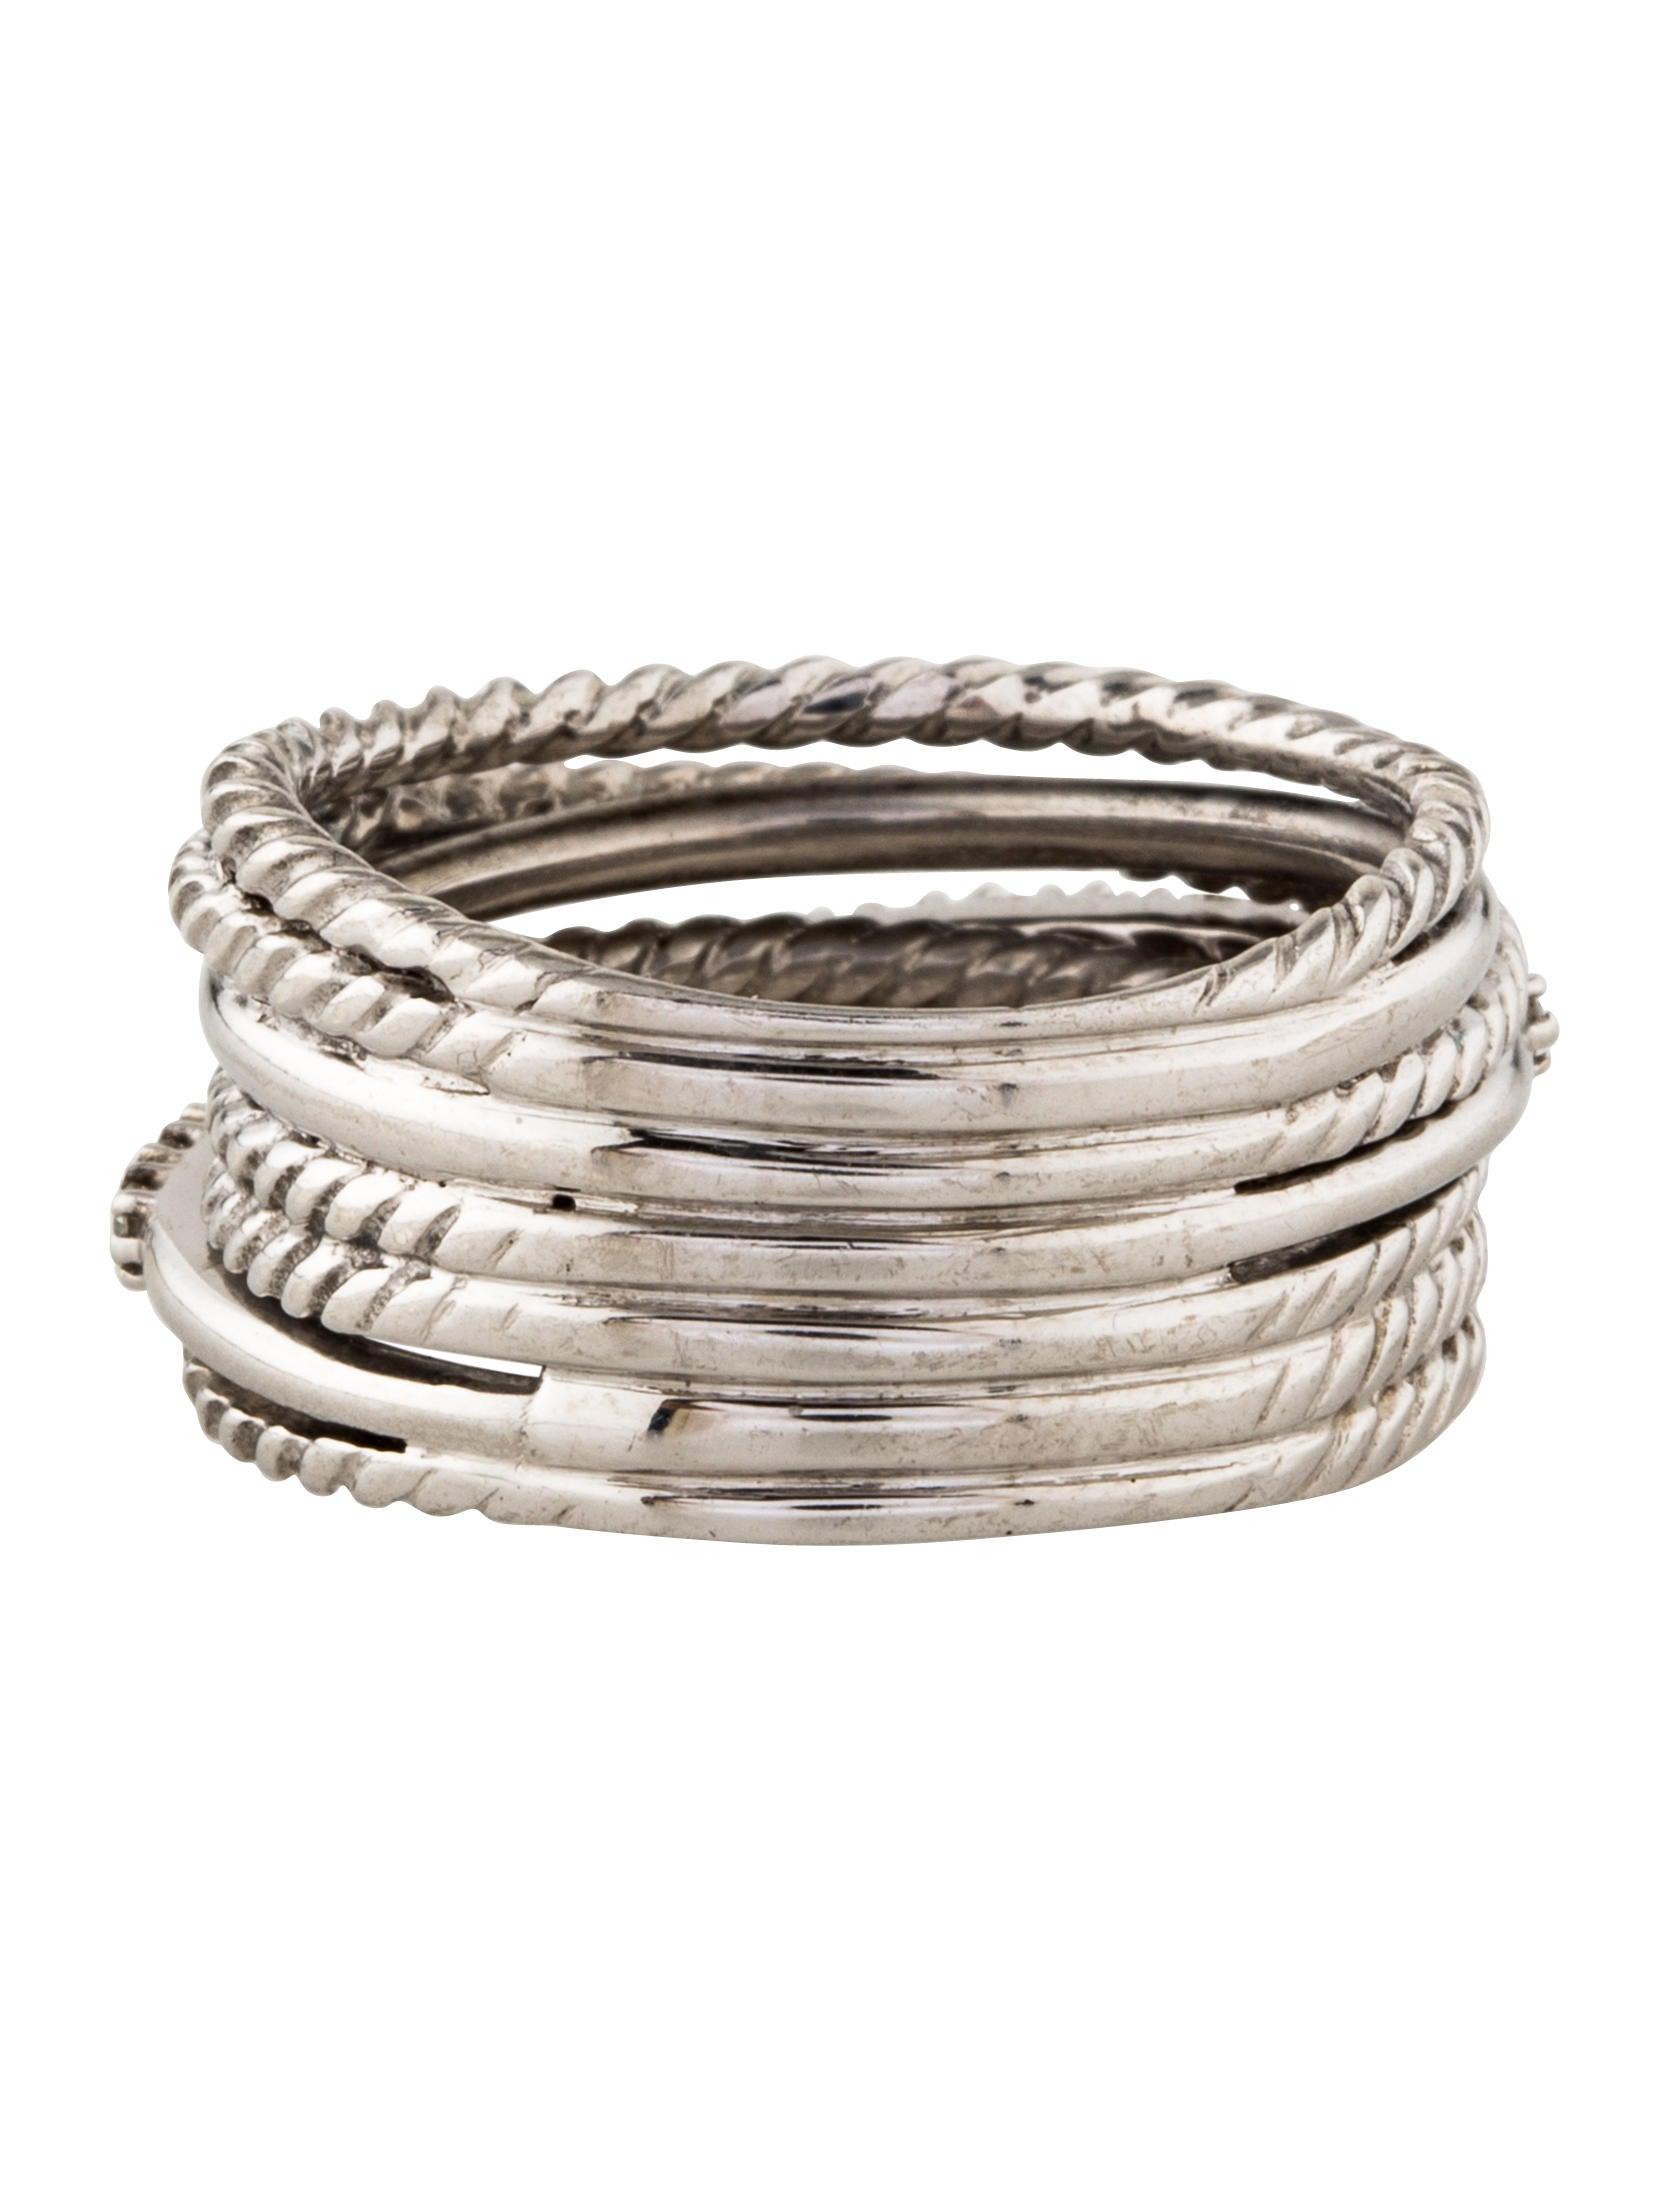 david yurman 14k crossover wide ring w tags